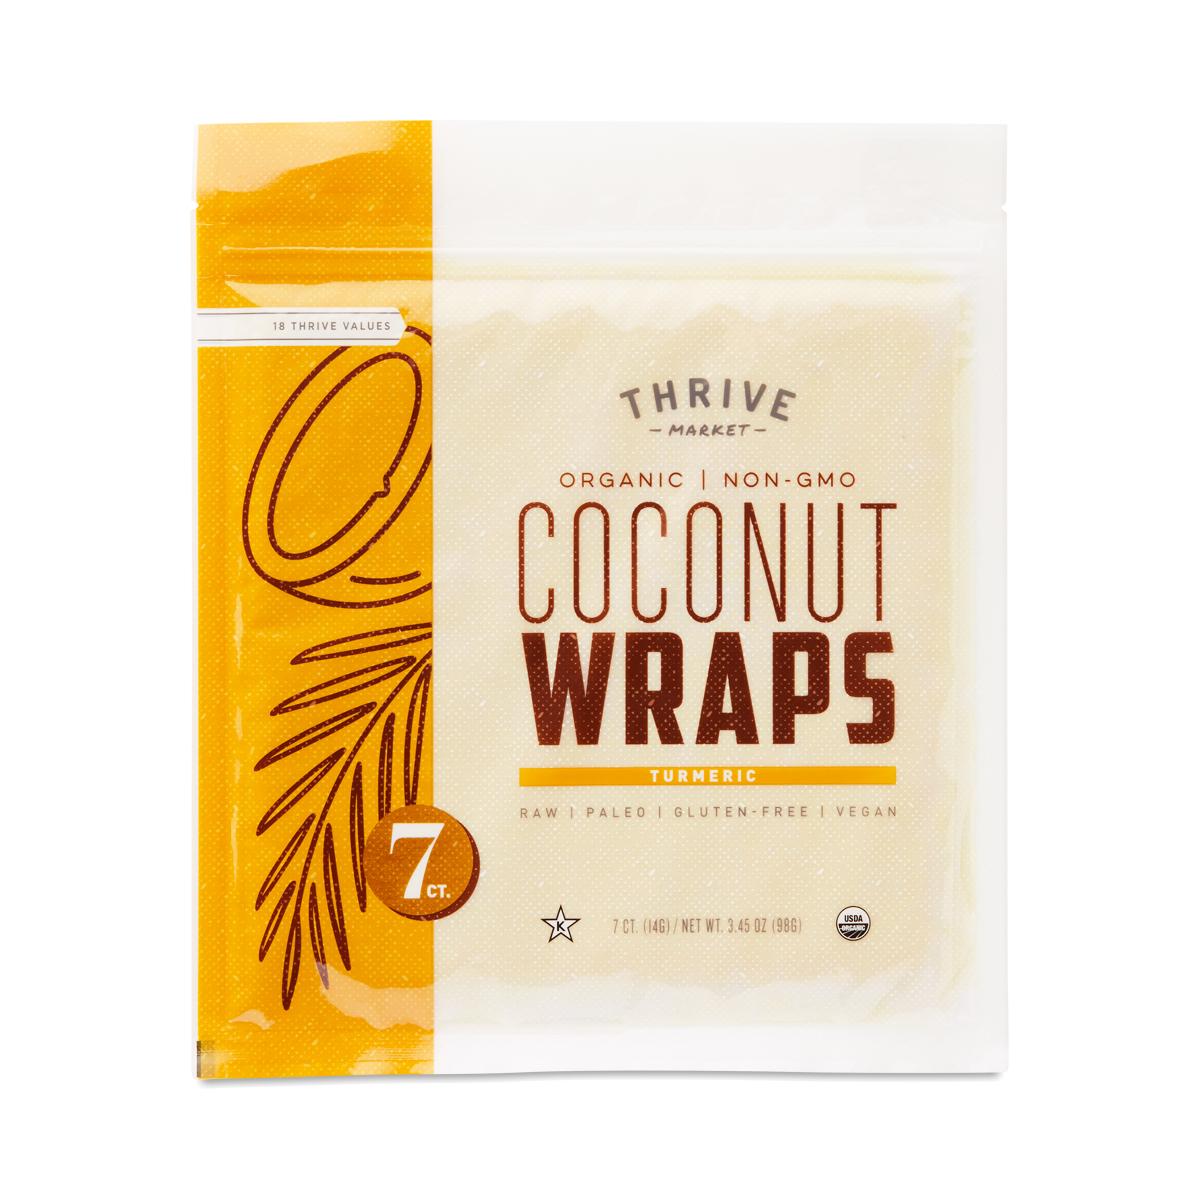 Thrive Market Organic Coconut Wraps, Turmeric 7 (14g wraps)